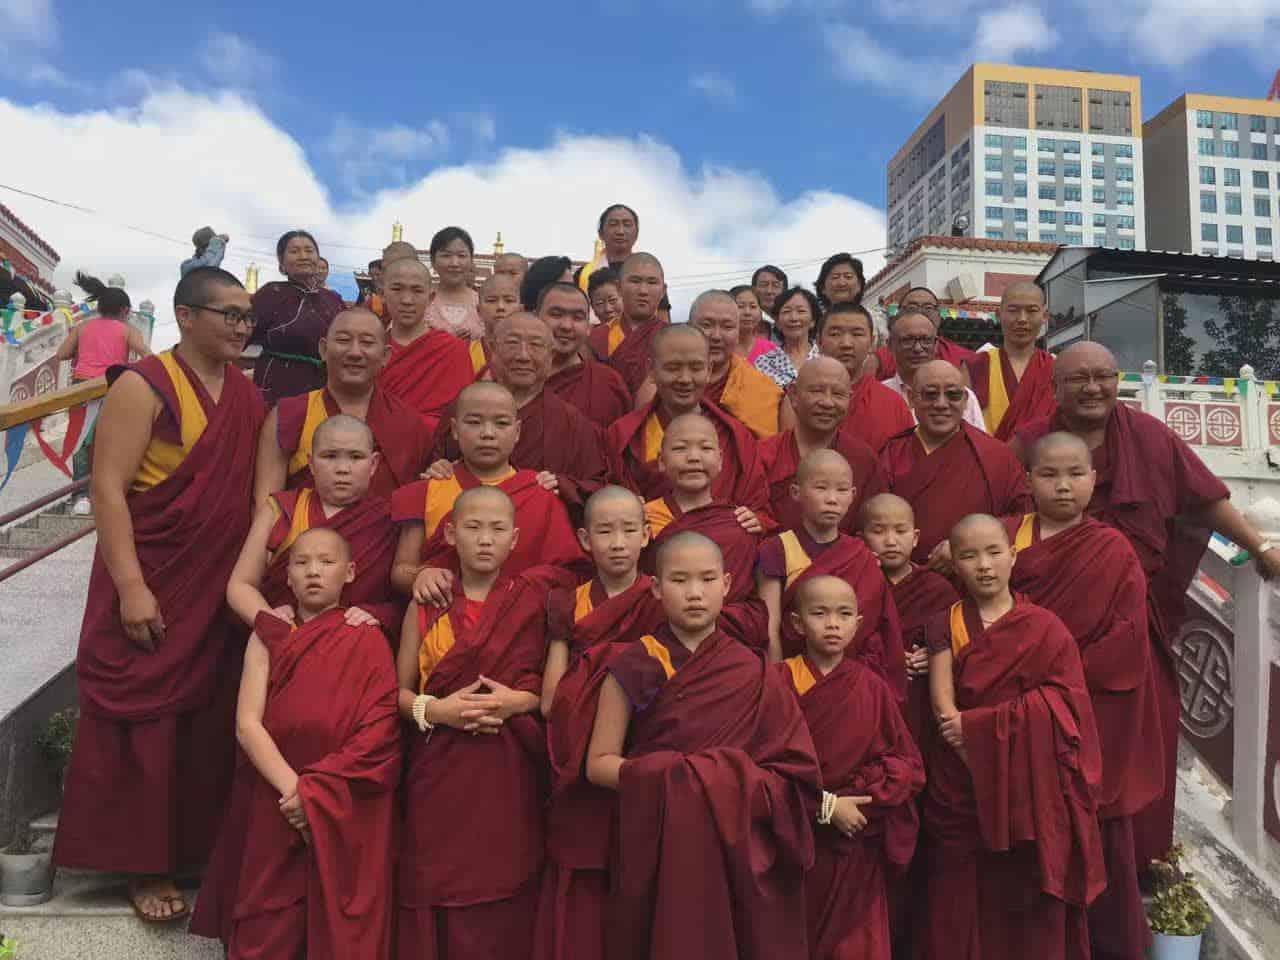 gosok-rinpoche-mongolia-2016-1bdcfa13090c177fe568134a9606156